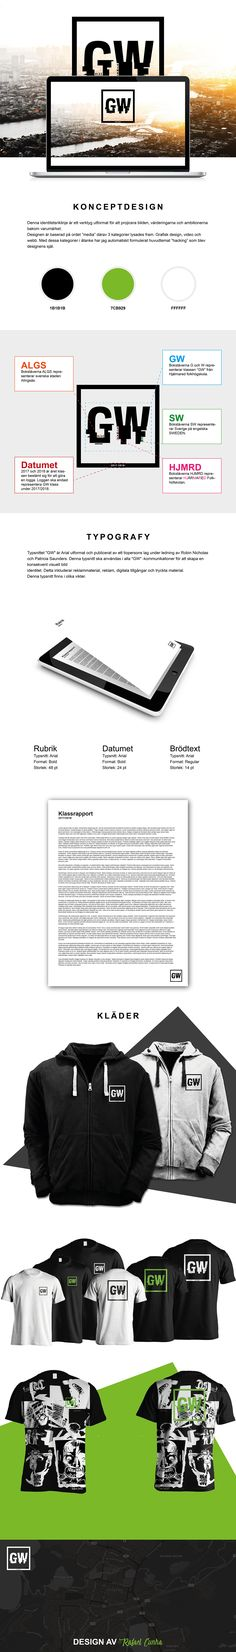 "Check out my @Behance project: ""GW logo concept design"" https://www.behance.net/gallery/59162323/GW-logo-concept-design"